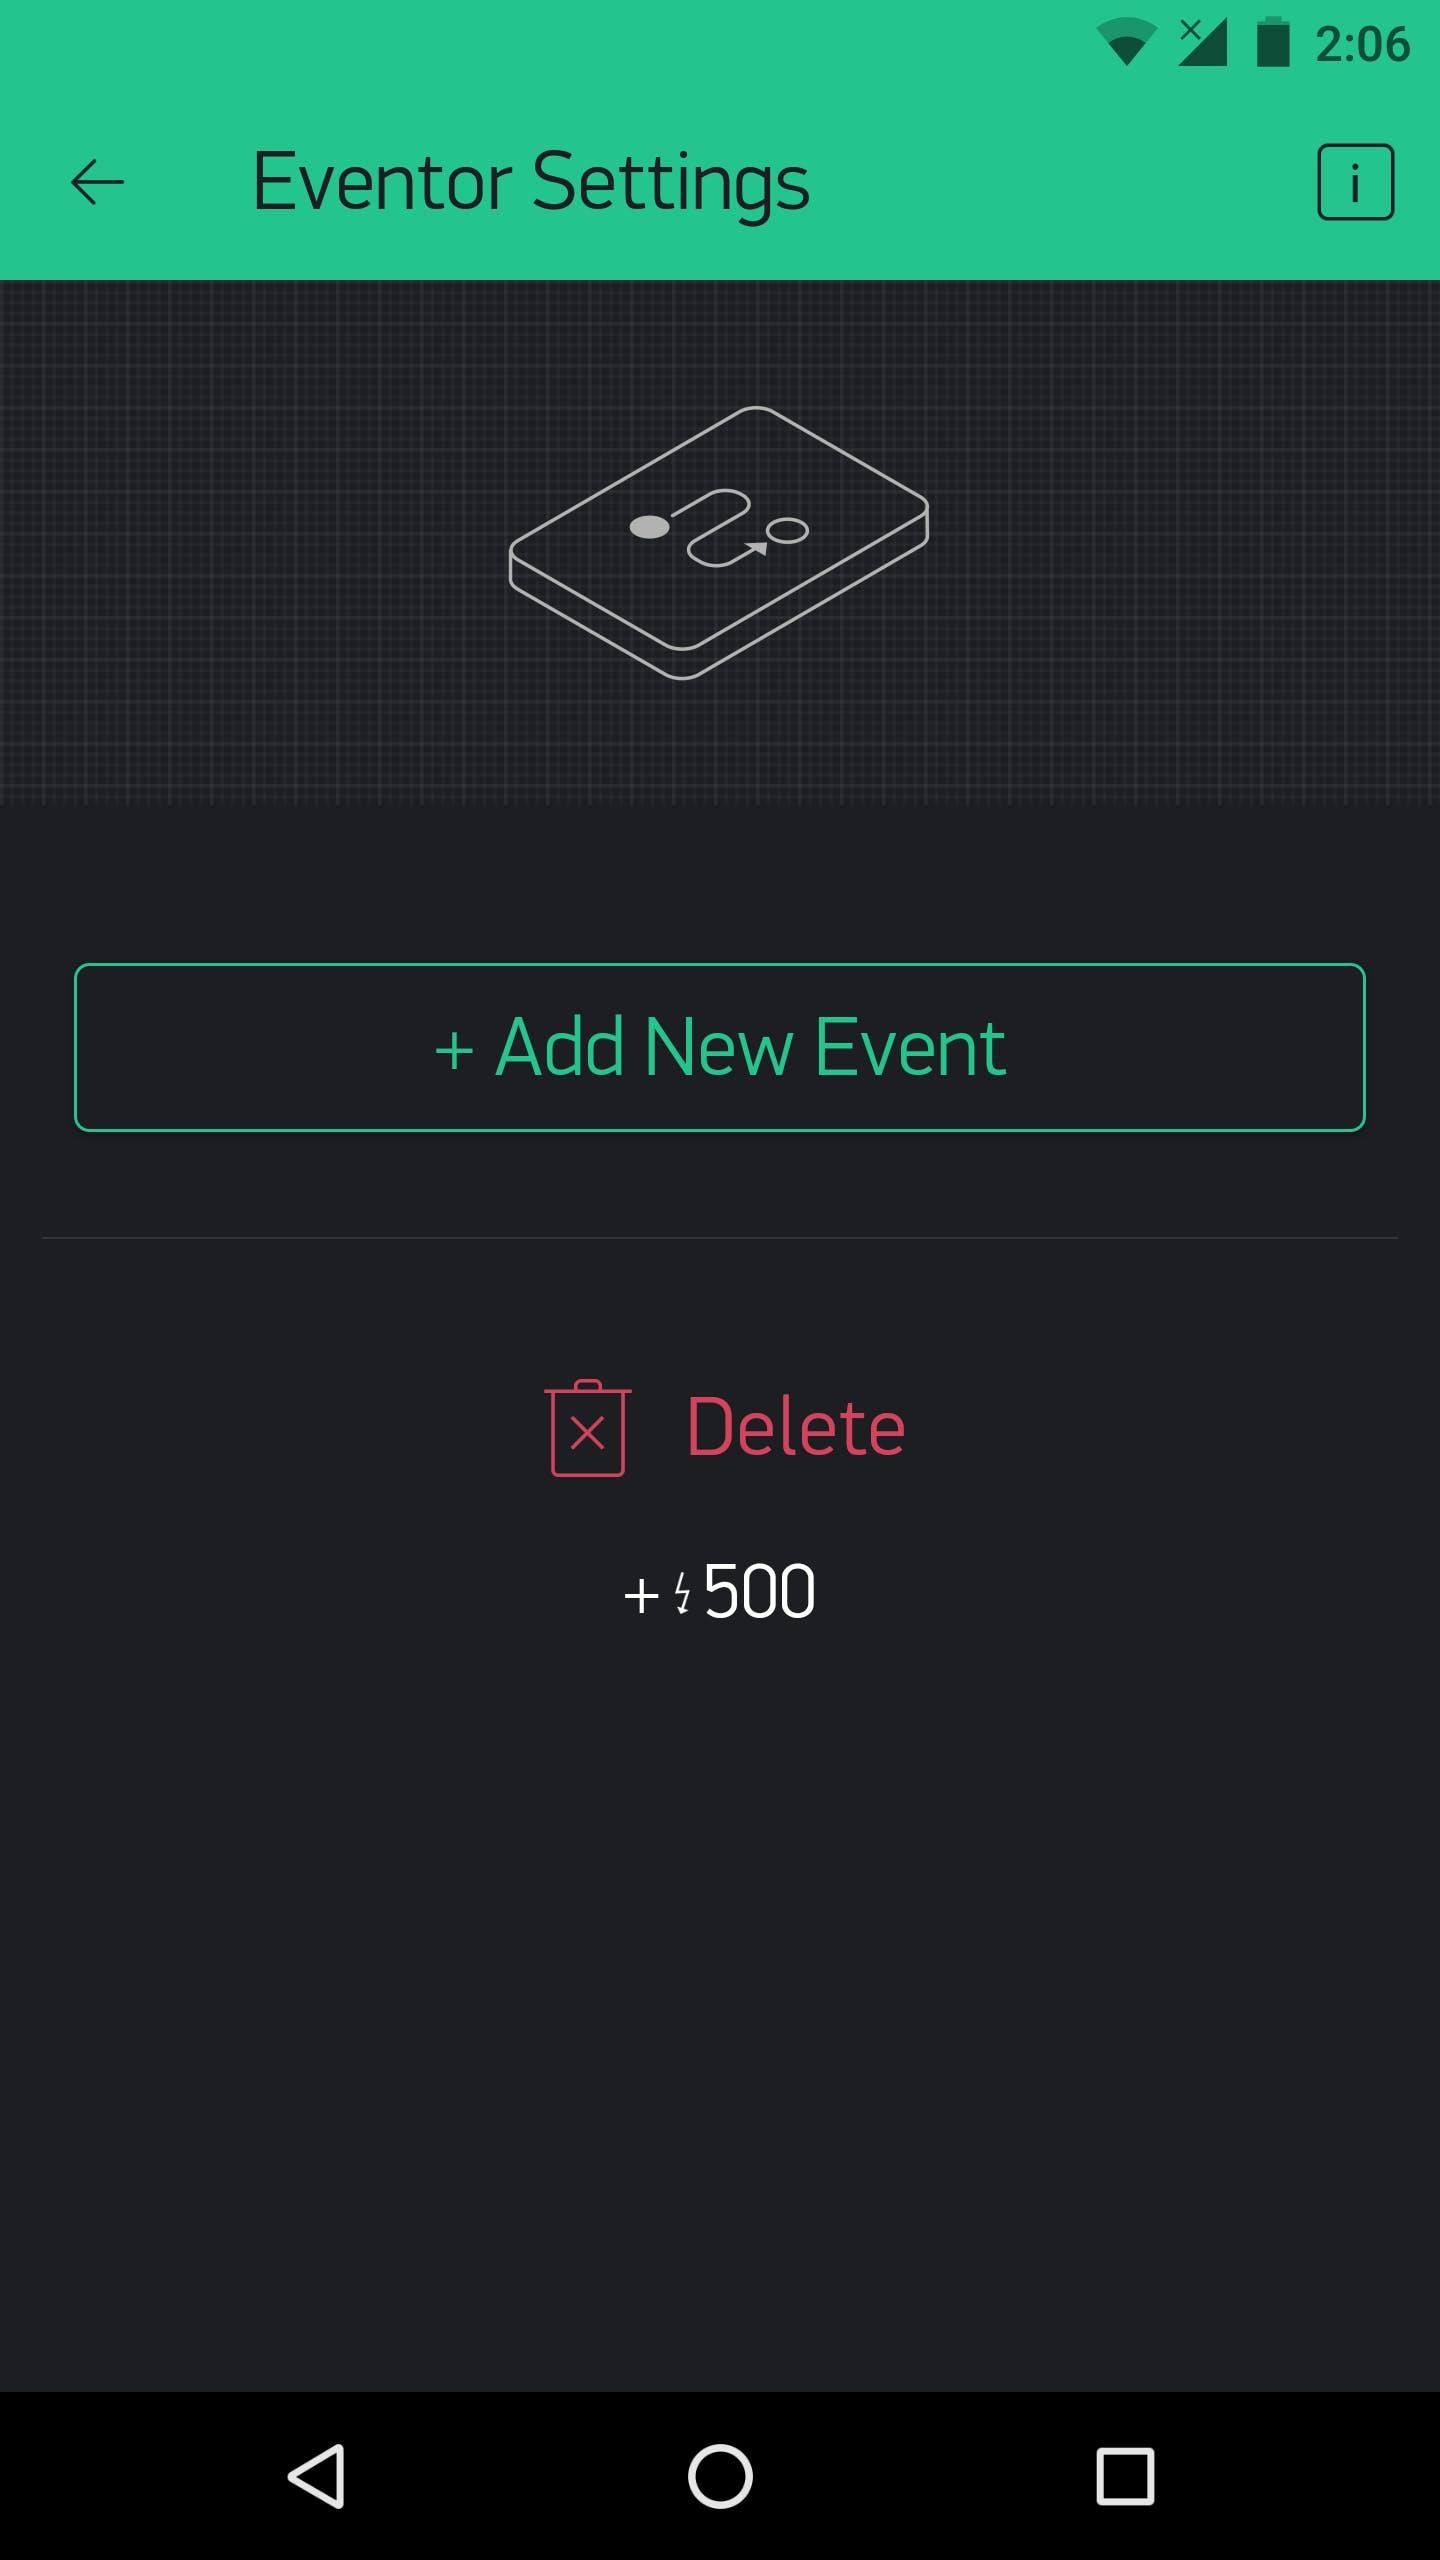 The Eventor widget